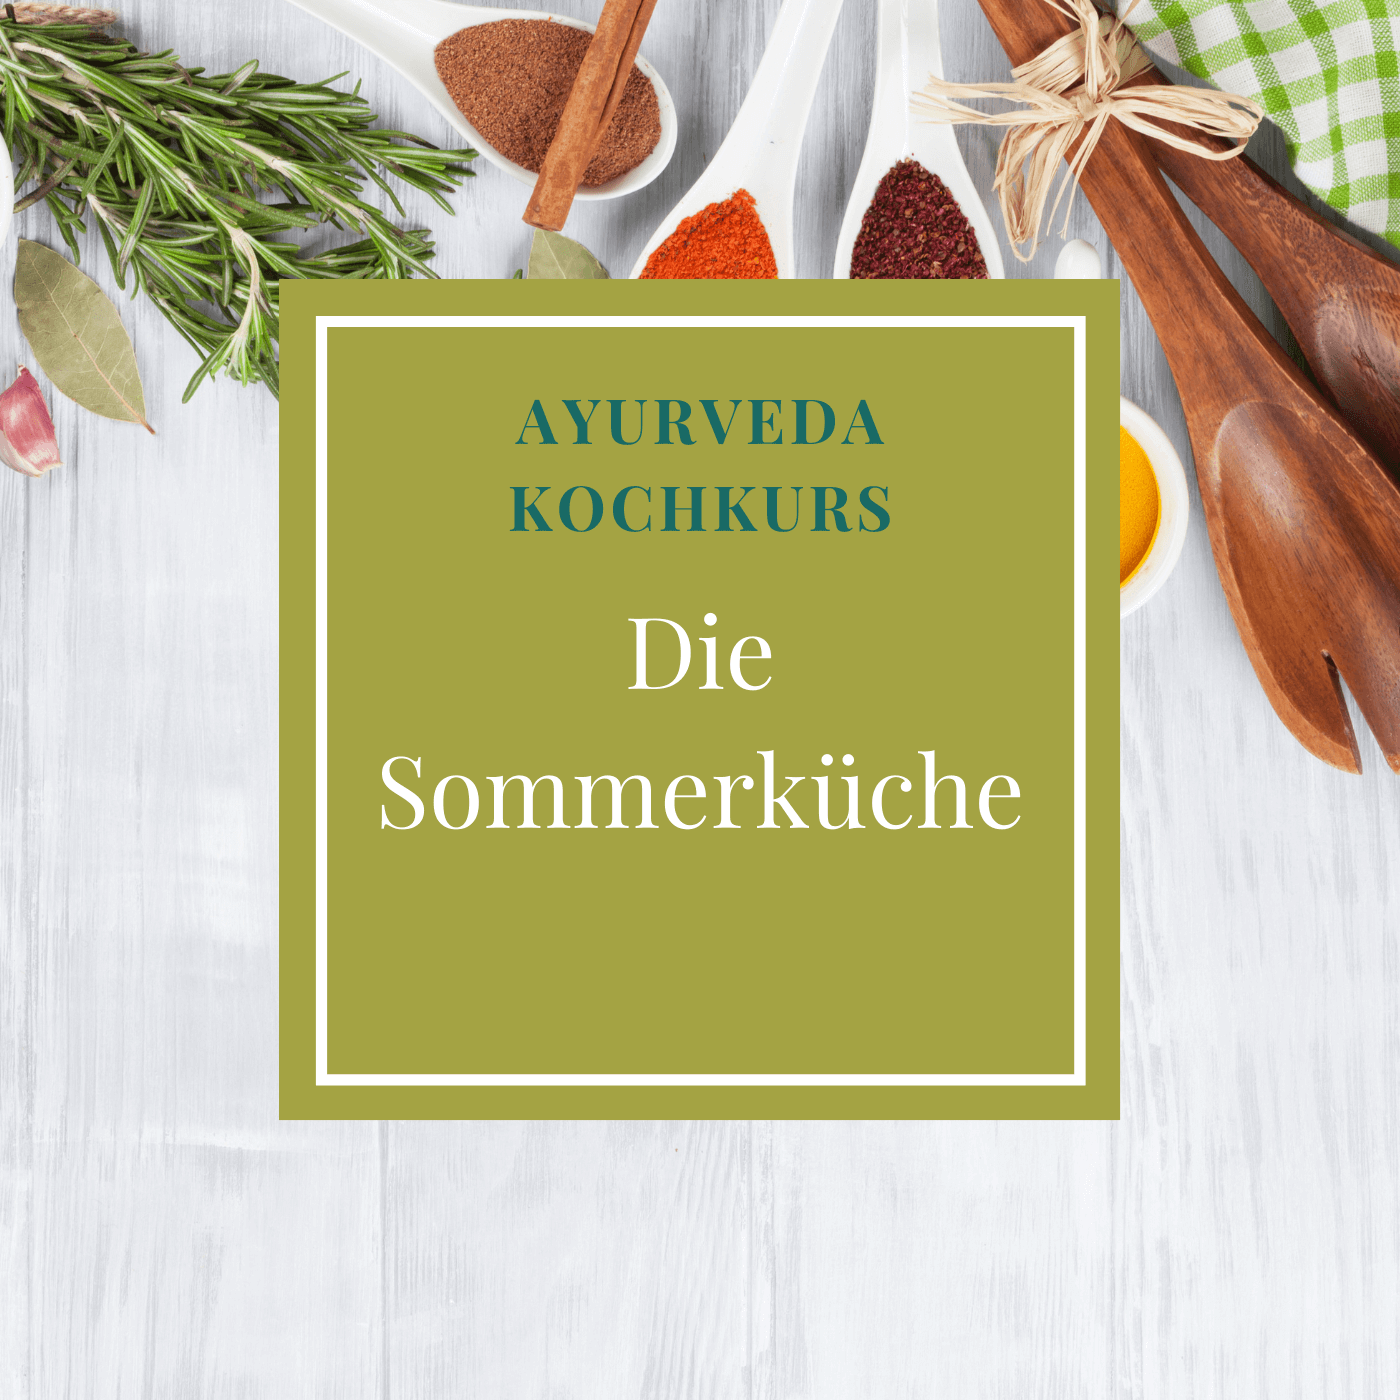 Ayurveda Kochkurs - Die Sommerküche